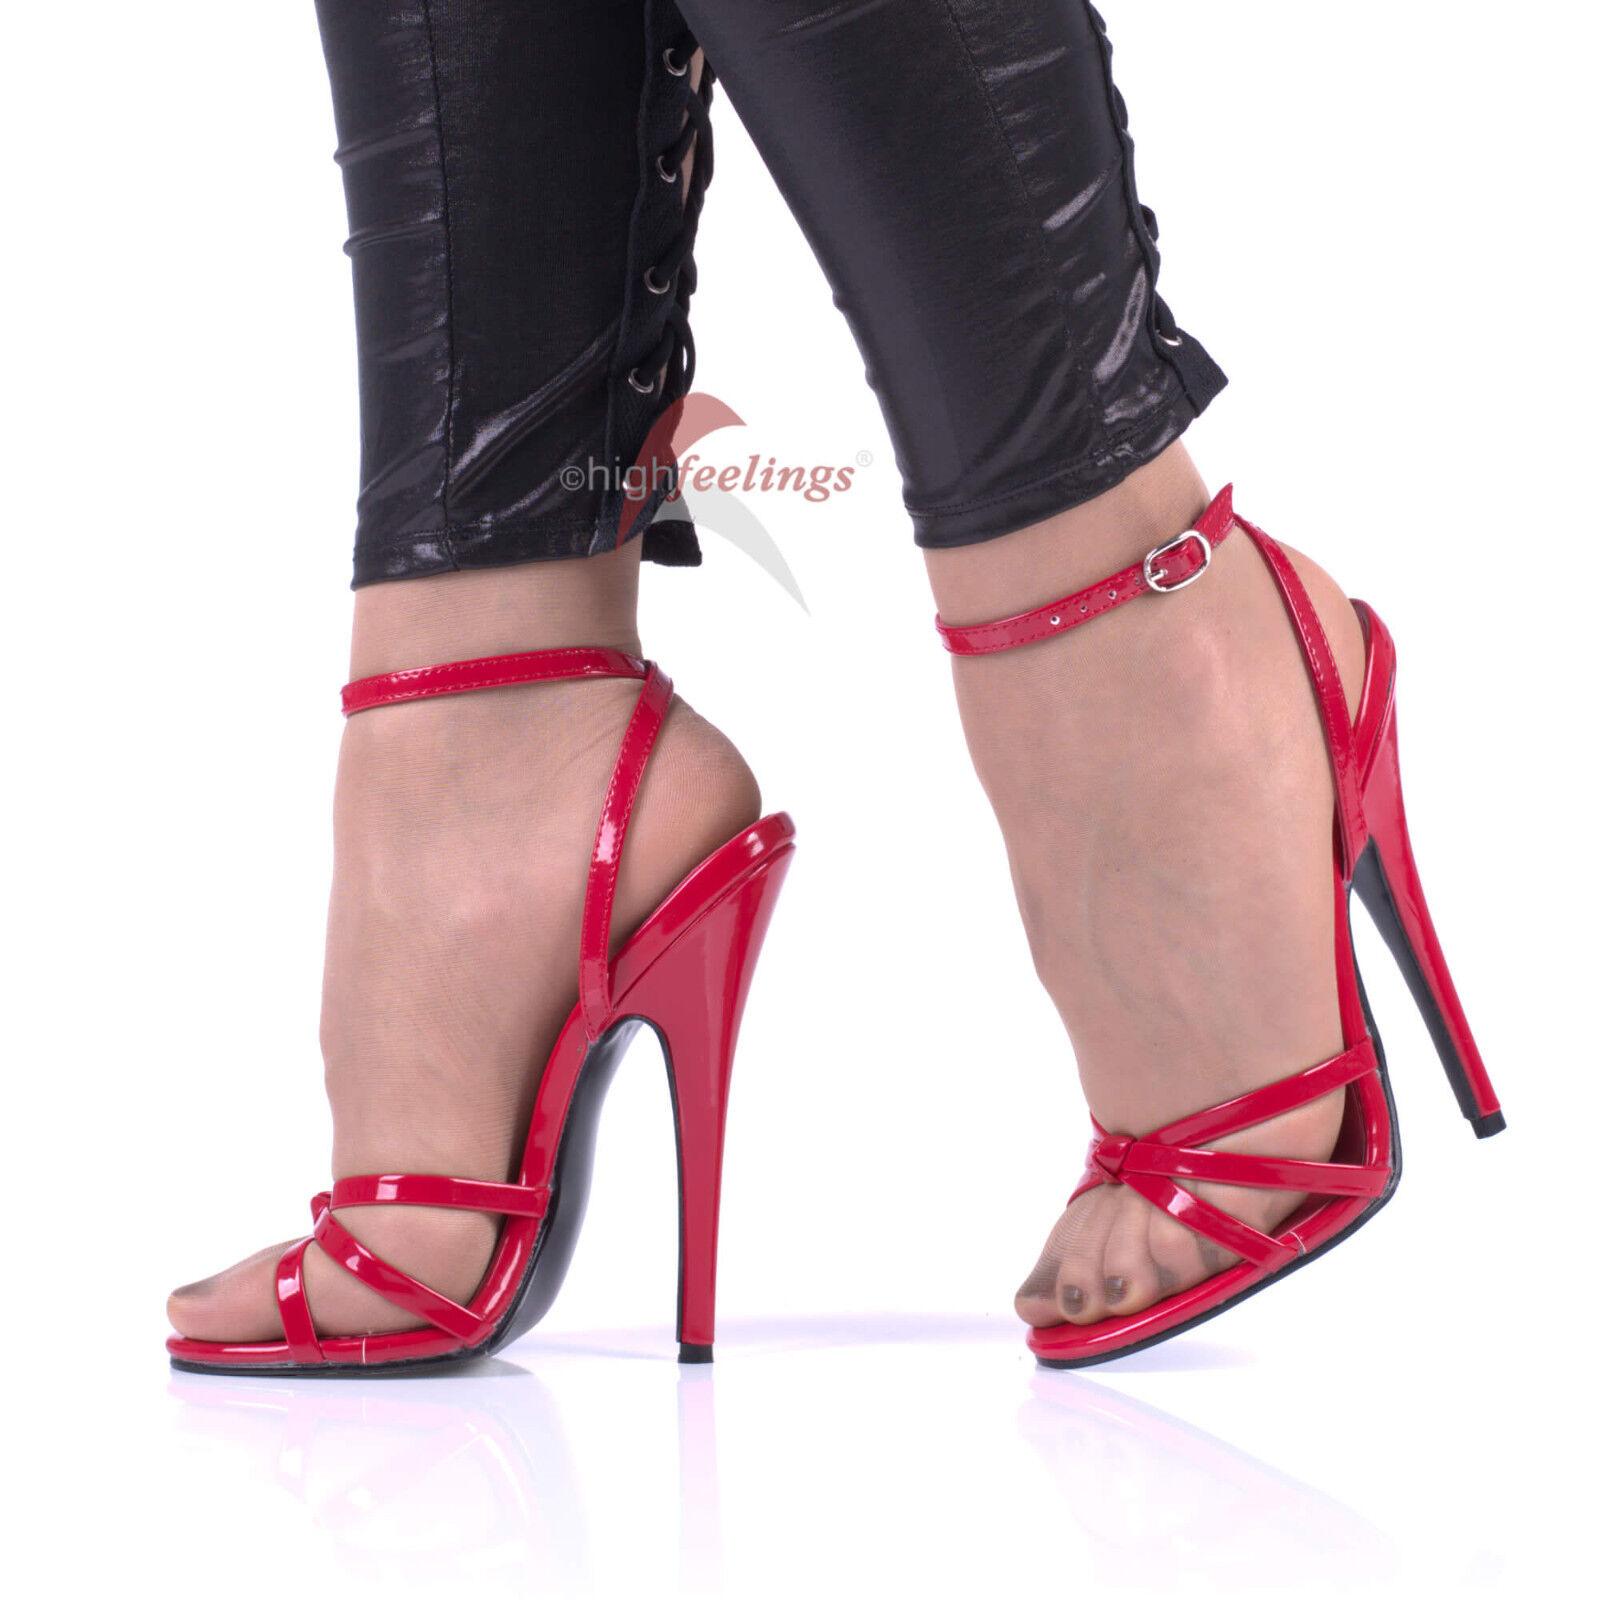 High Heels Riemchen Sandaleetten Rot Lack 13,5 - 16 cm Absatz Größe EUR 37 - 47